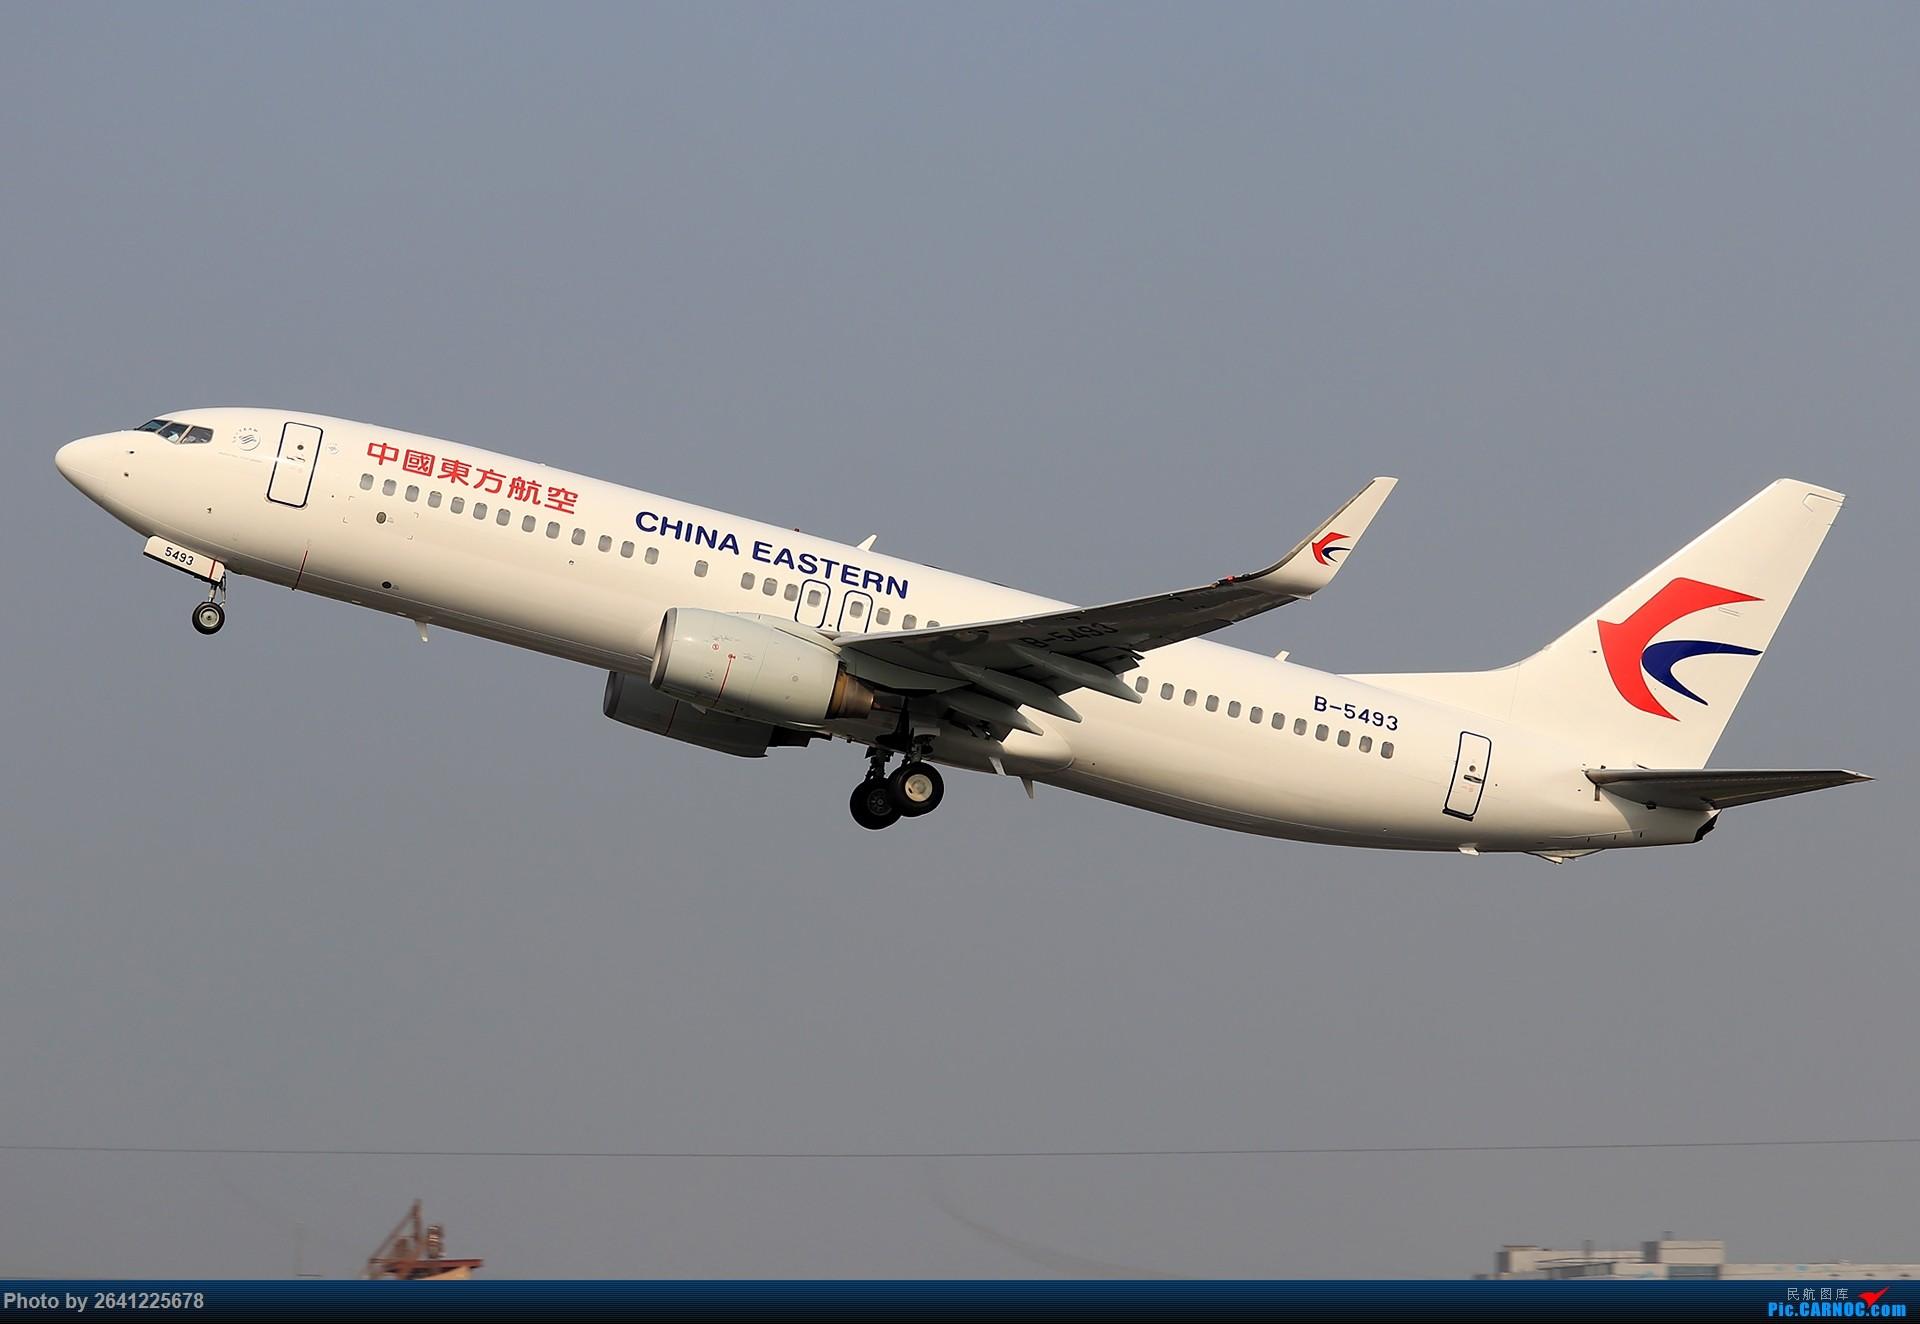 Re:[原创]【TAMRON 156 G2+77D 持续更新中】*****试新机+新镜*****(烂天+地热+渣技术,望大佬多多包涵) BOEING 737-800 B-5493 中国北京首都国际机场